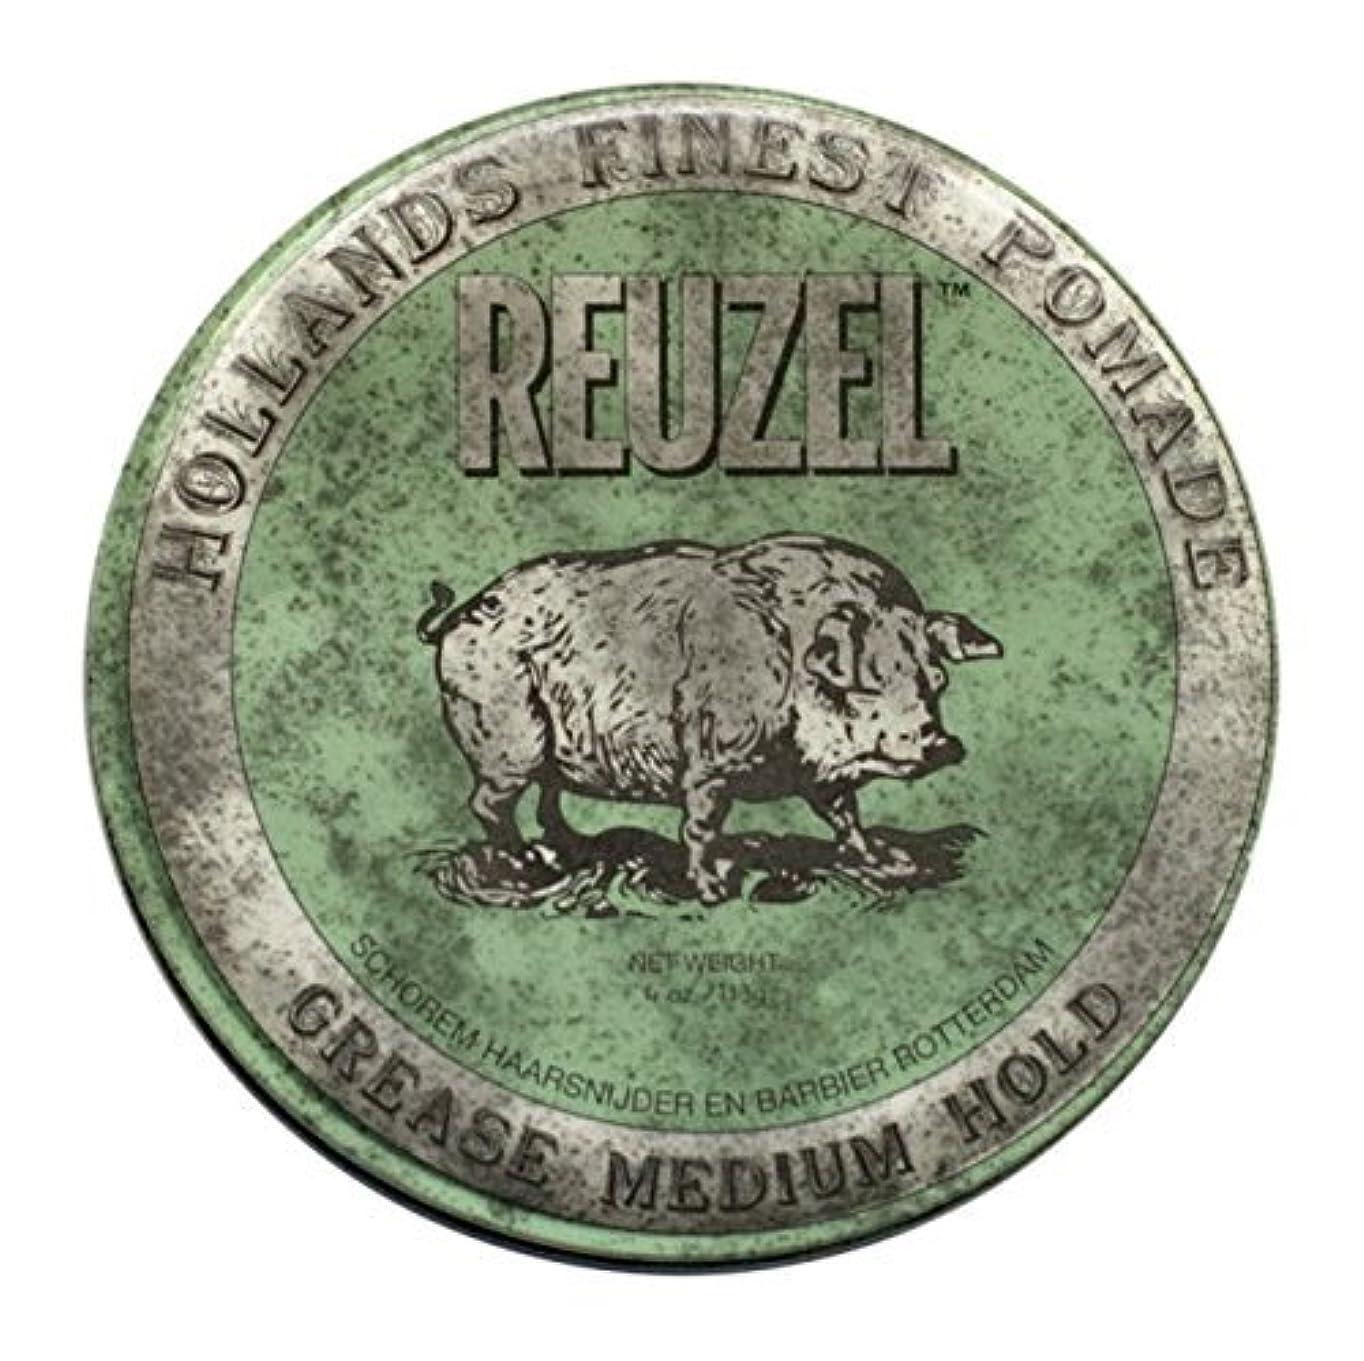 Reuzel Green Grease Medium Hold Hair Styling Pomade Piglet 1.3oz (35g) Wax/Gel by Reuzel